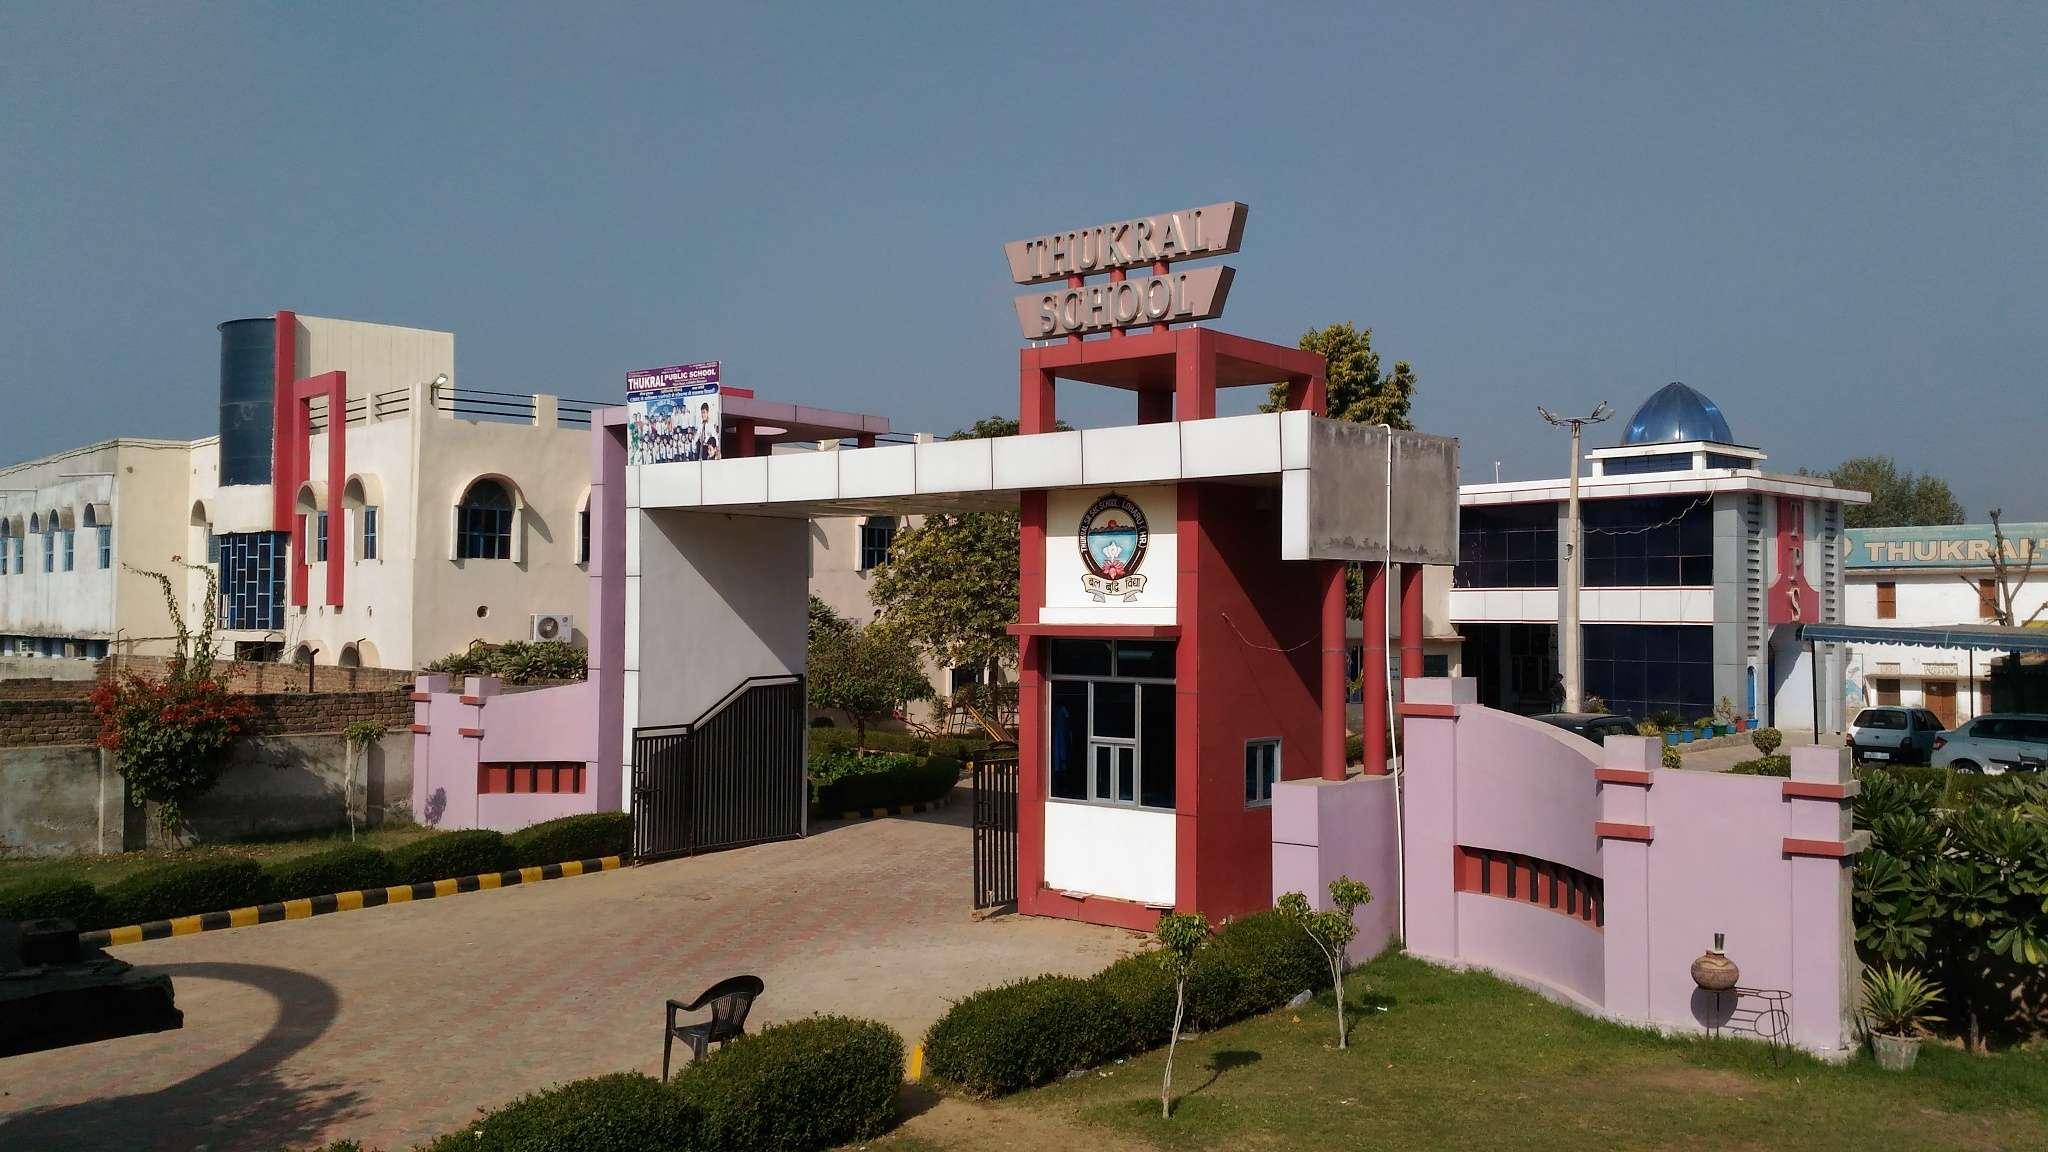 THUKRAL PUBLIC SR SEC SCHOOL Thukral Public Sr Sec School Pilani Road Loharu Bhiwani Haryana 530661